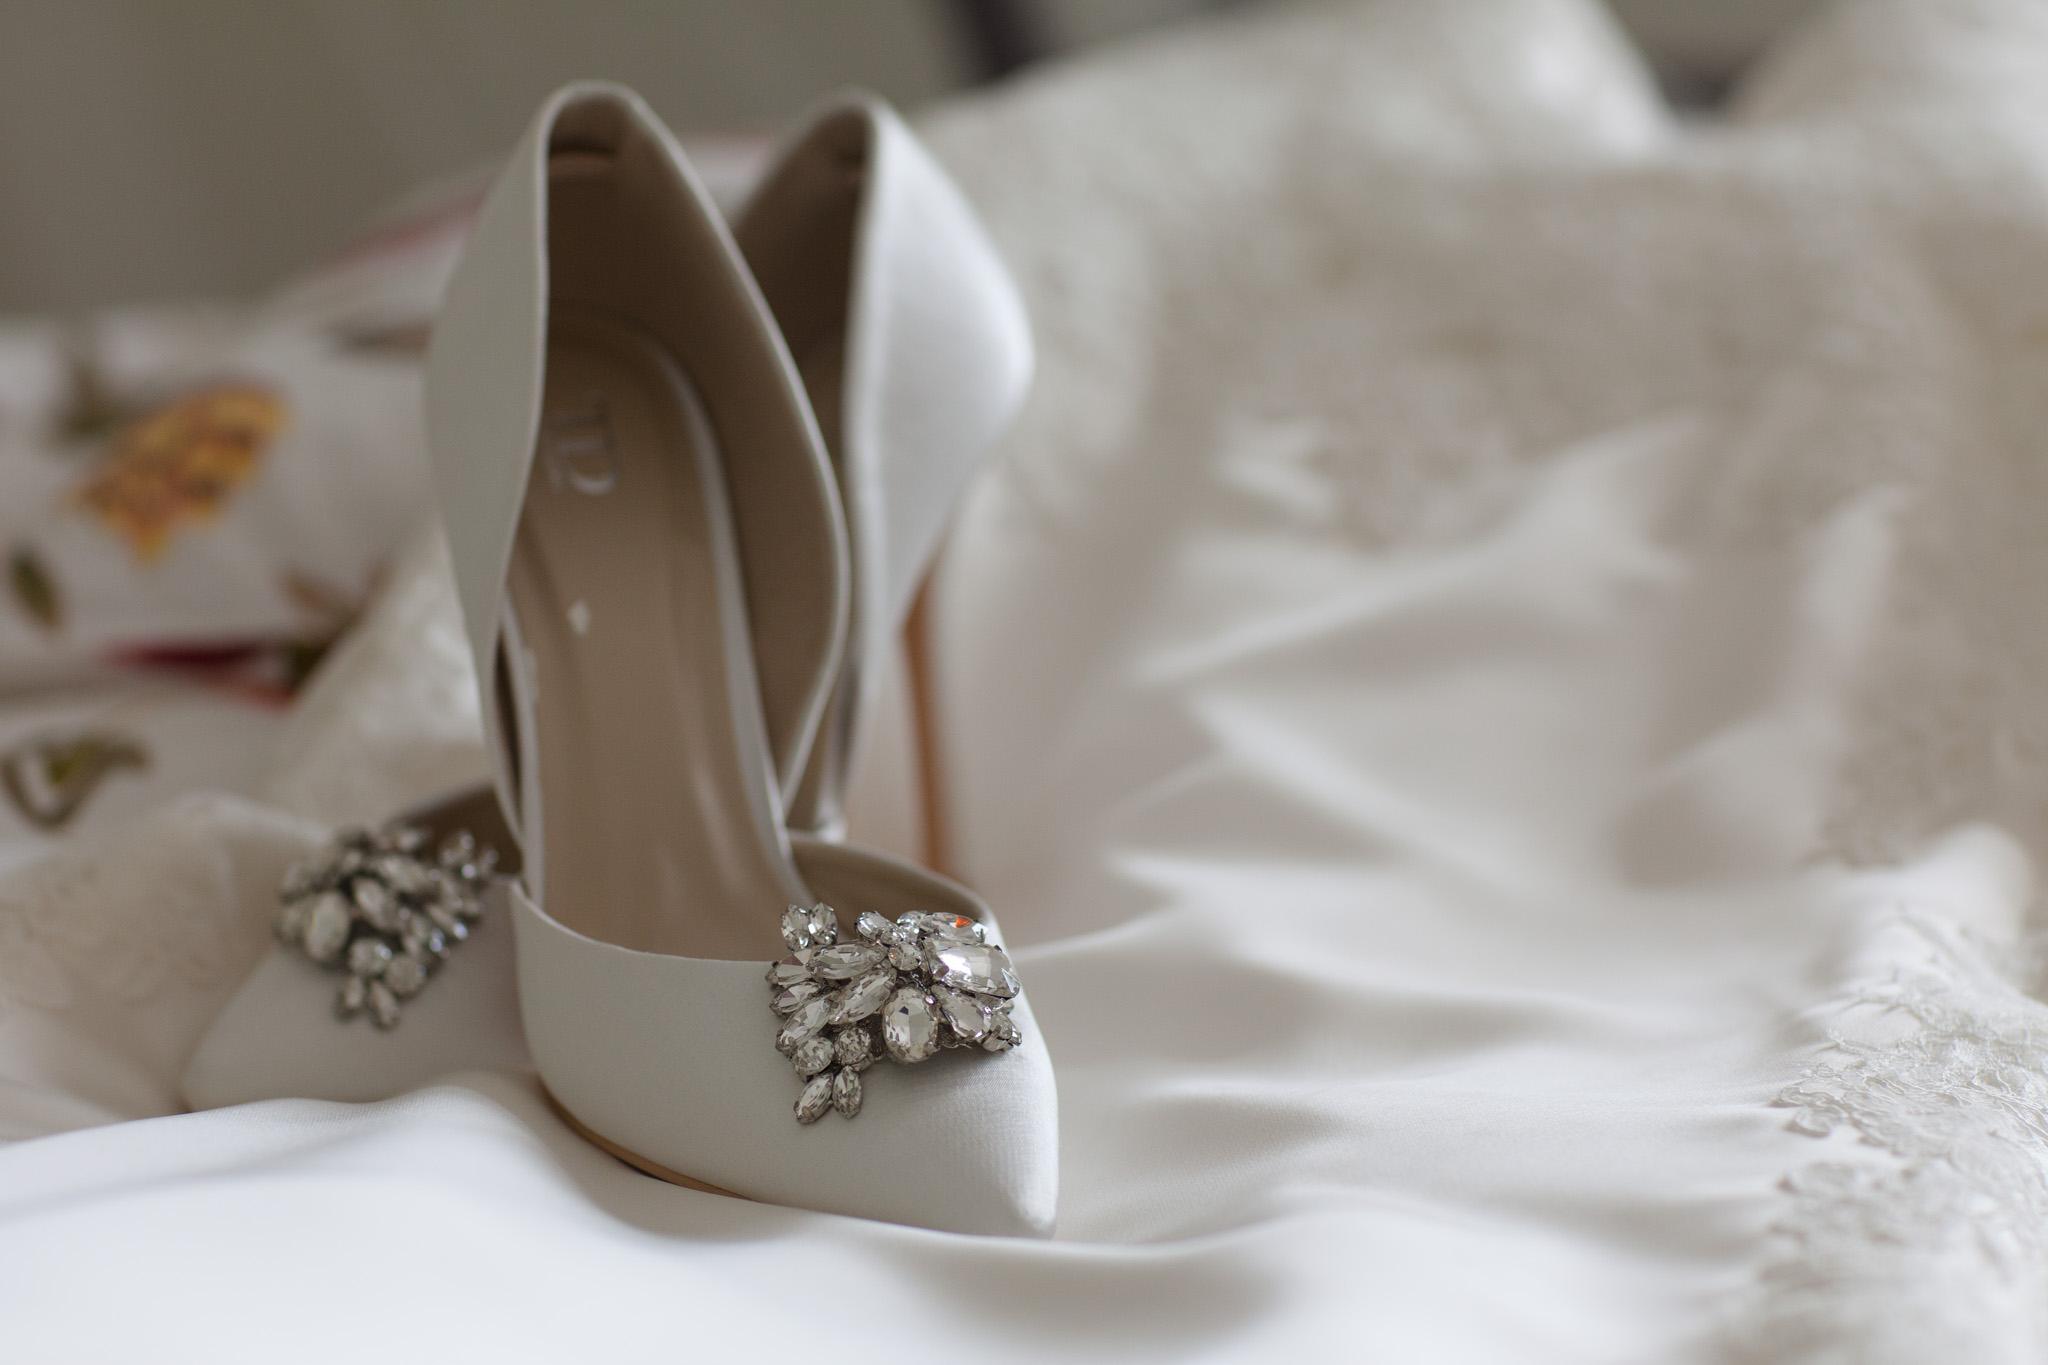 Mark_Barnes_Northern_Ireland_Wedding_Photography_Leighinmohr-house-hotel-ballymena_Wedding_Photography-3.jpg